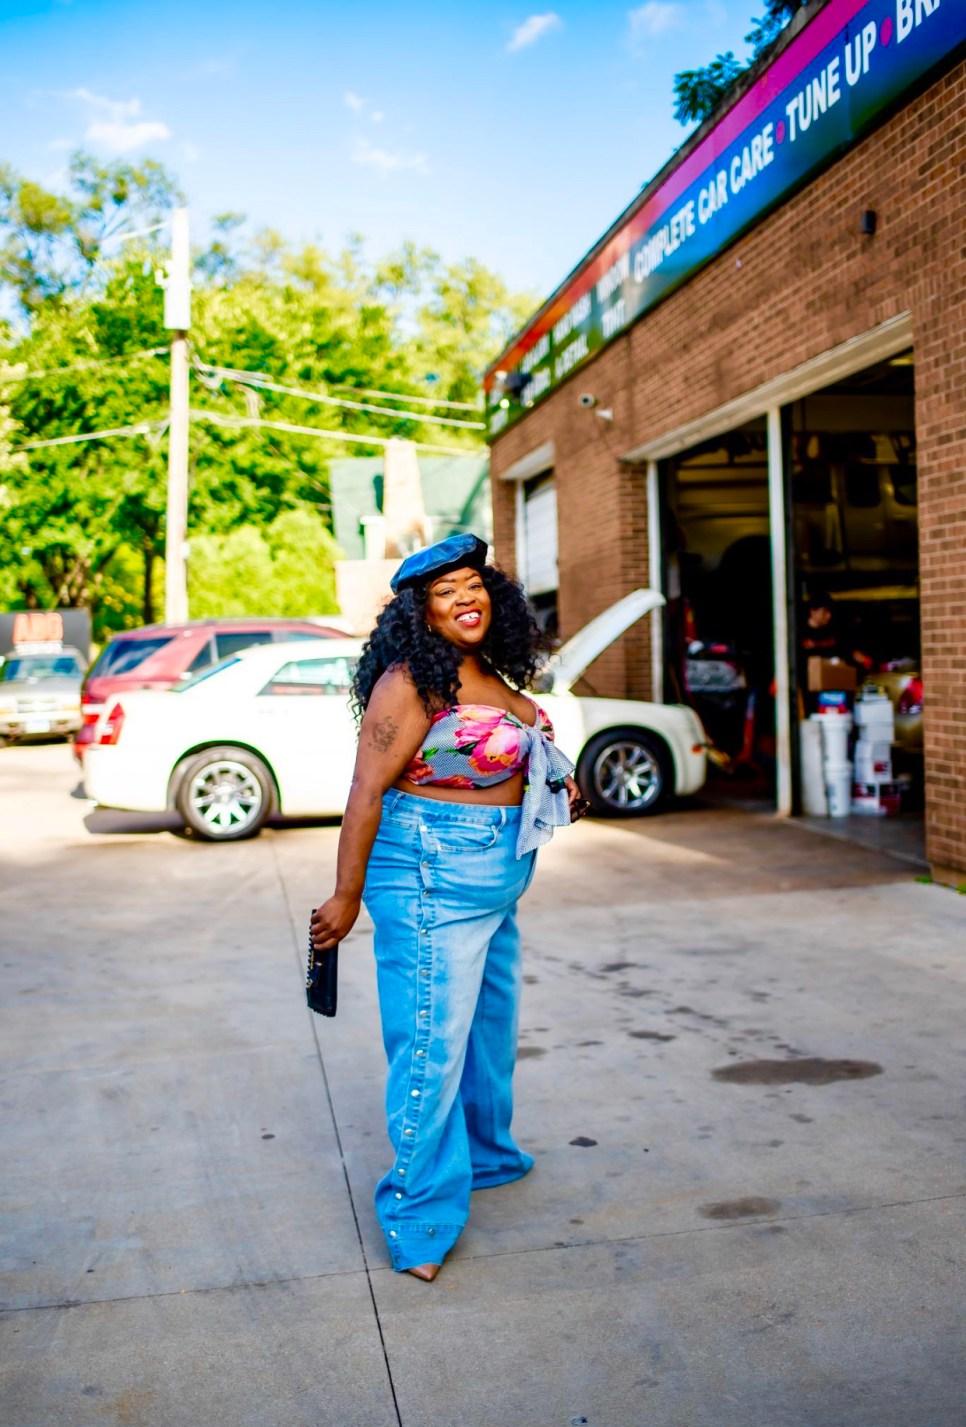 plus-size fashion, thefatgirloffashion, Fashion To Figure Garnerstyle Hotline Tearaway Jeans